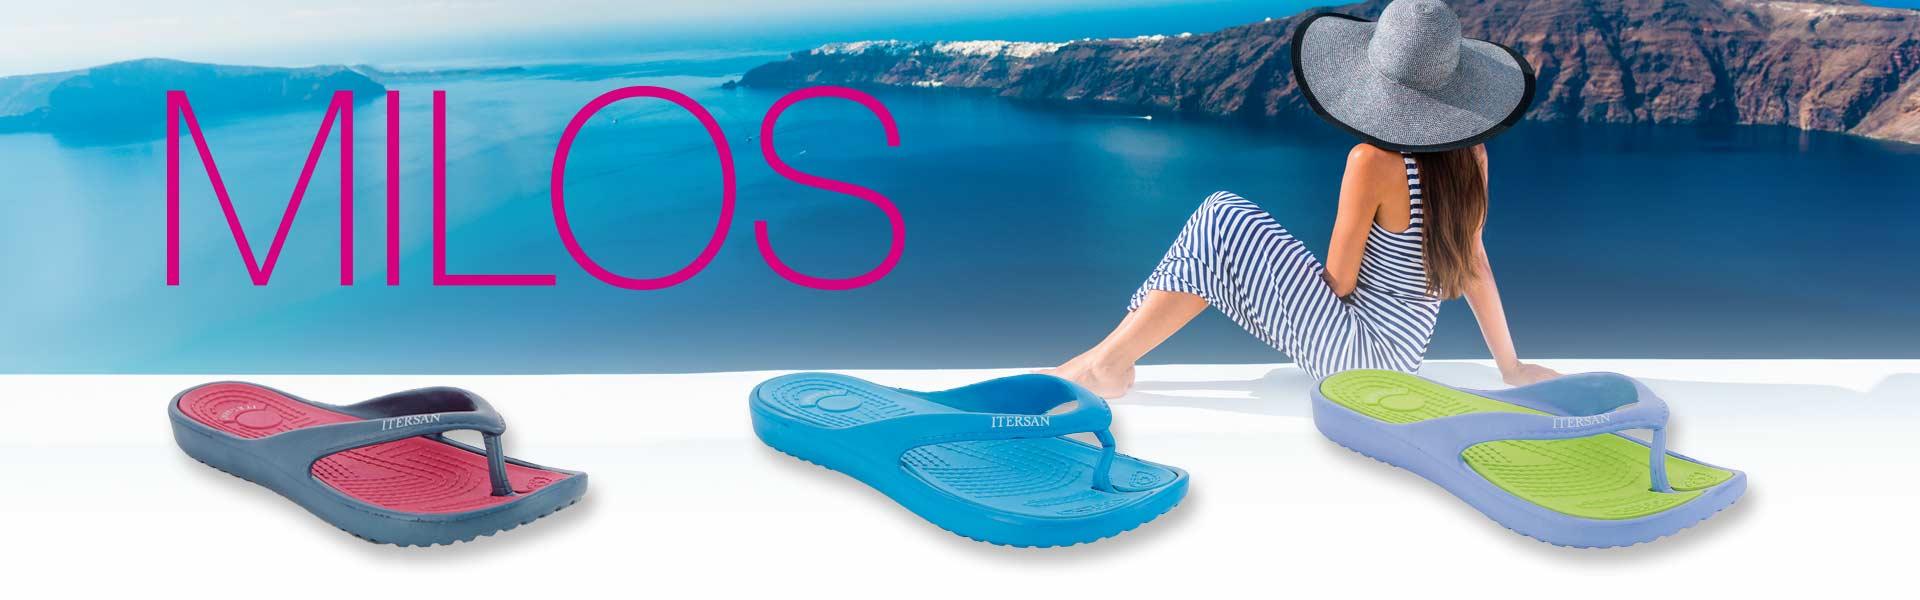 slide-milos-itersan-1920x600px-min